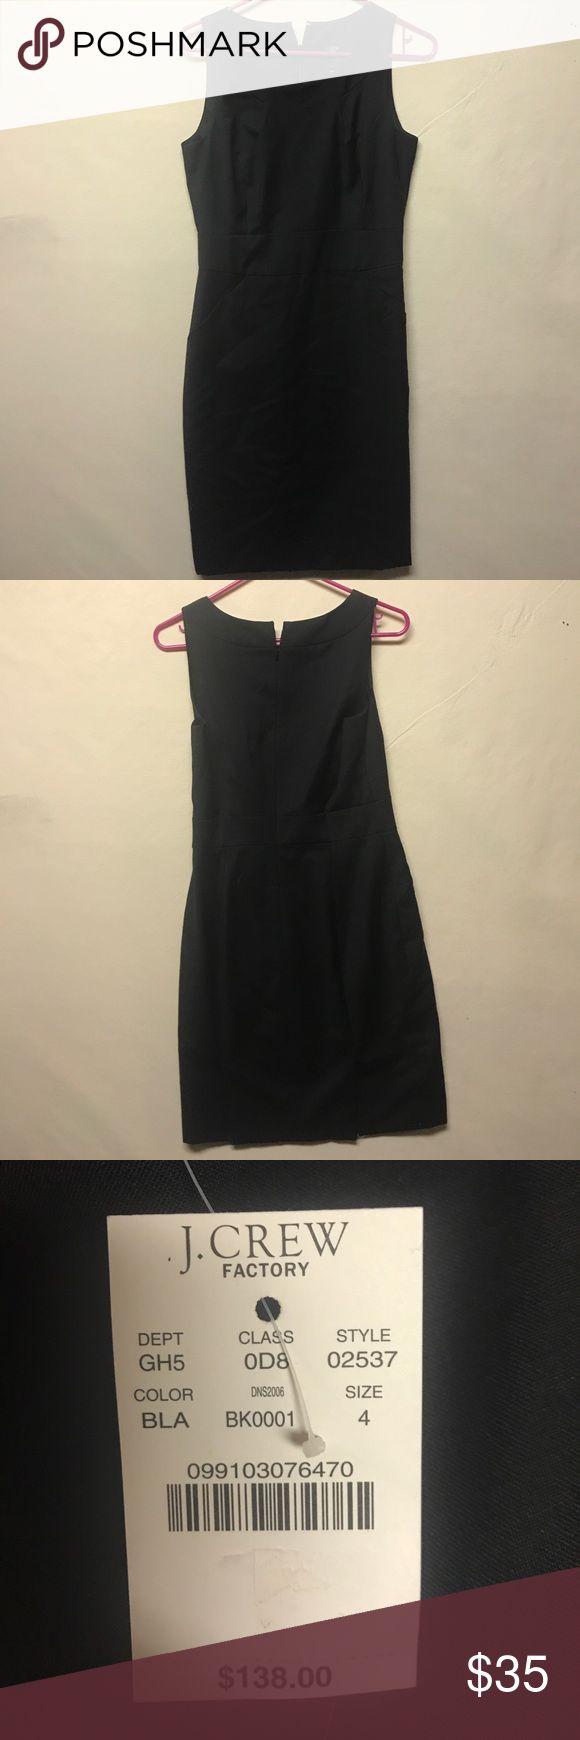 J Crew factory black suiting dress. J Crew factory black suiting dress. Brand new. Never worn tags still attached J. Crew Factory Dresses